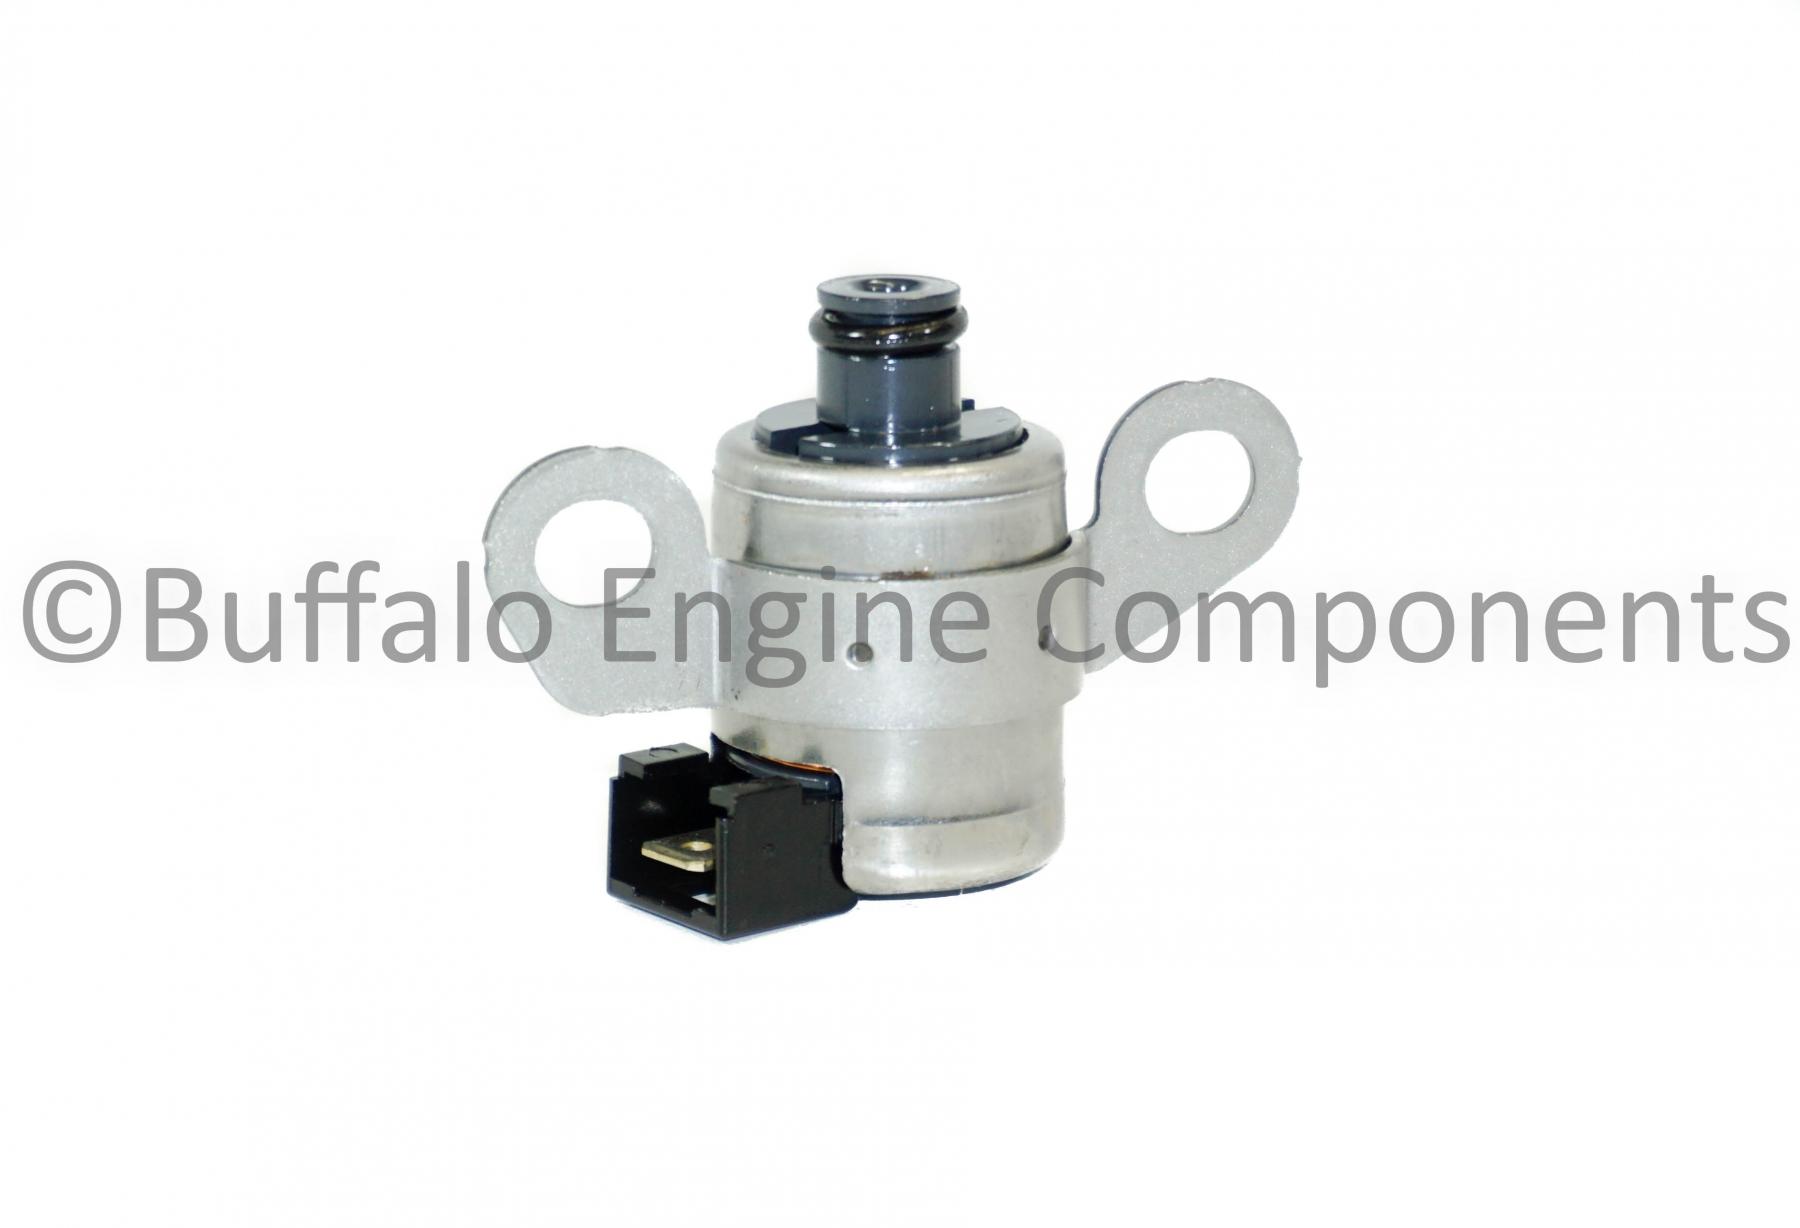 Catalog | Buffalo Engine Components